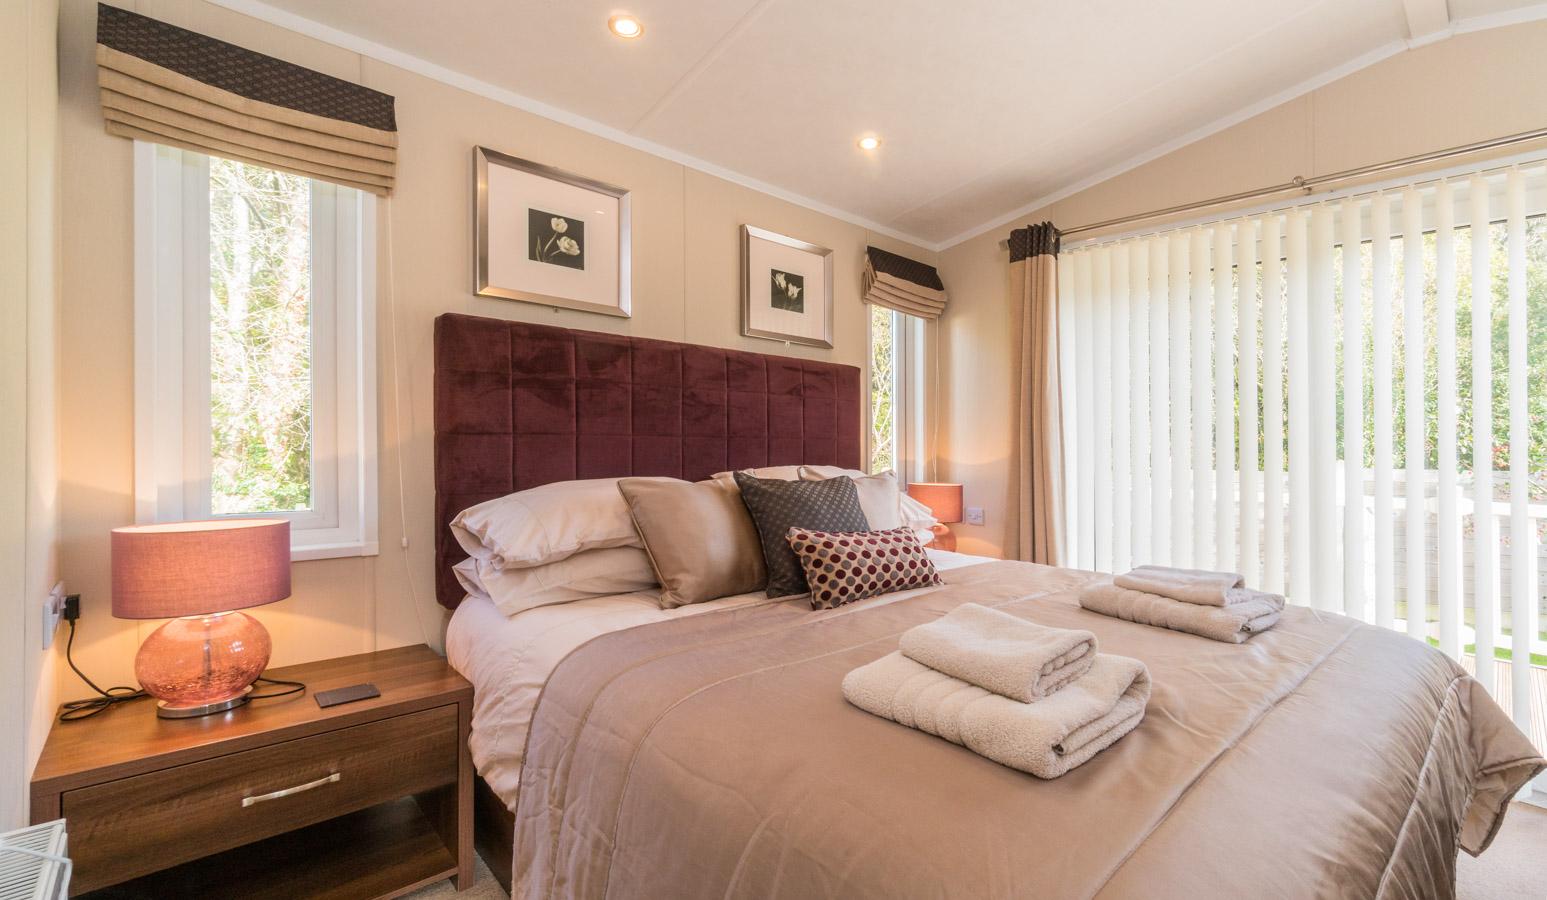 Neil-Bigwood-Monkton-Wyld-Holiday-Homes-56